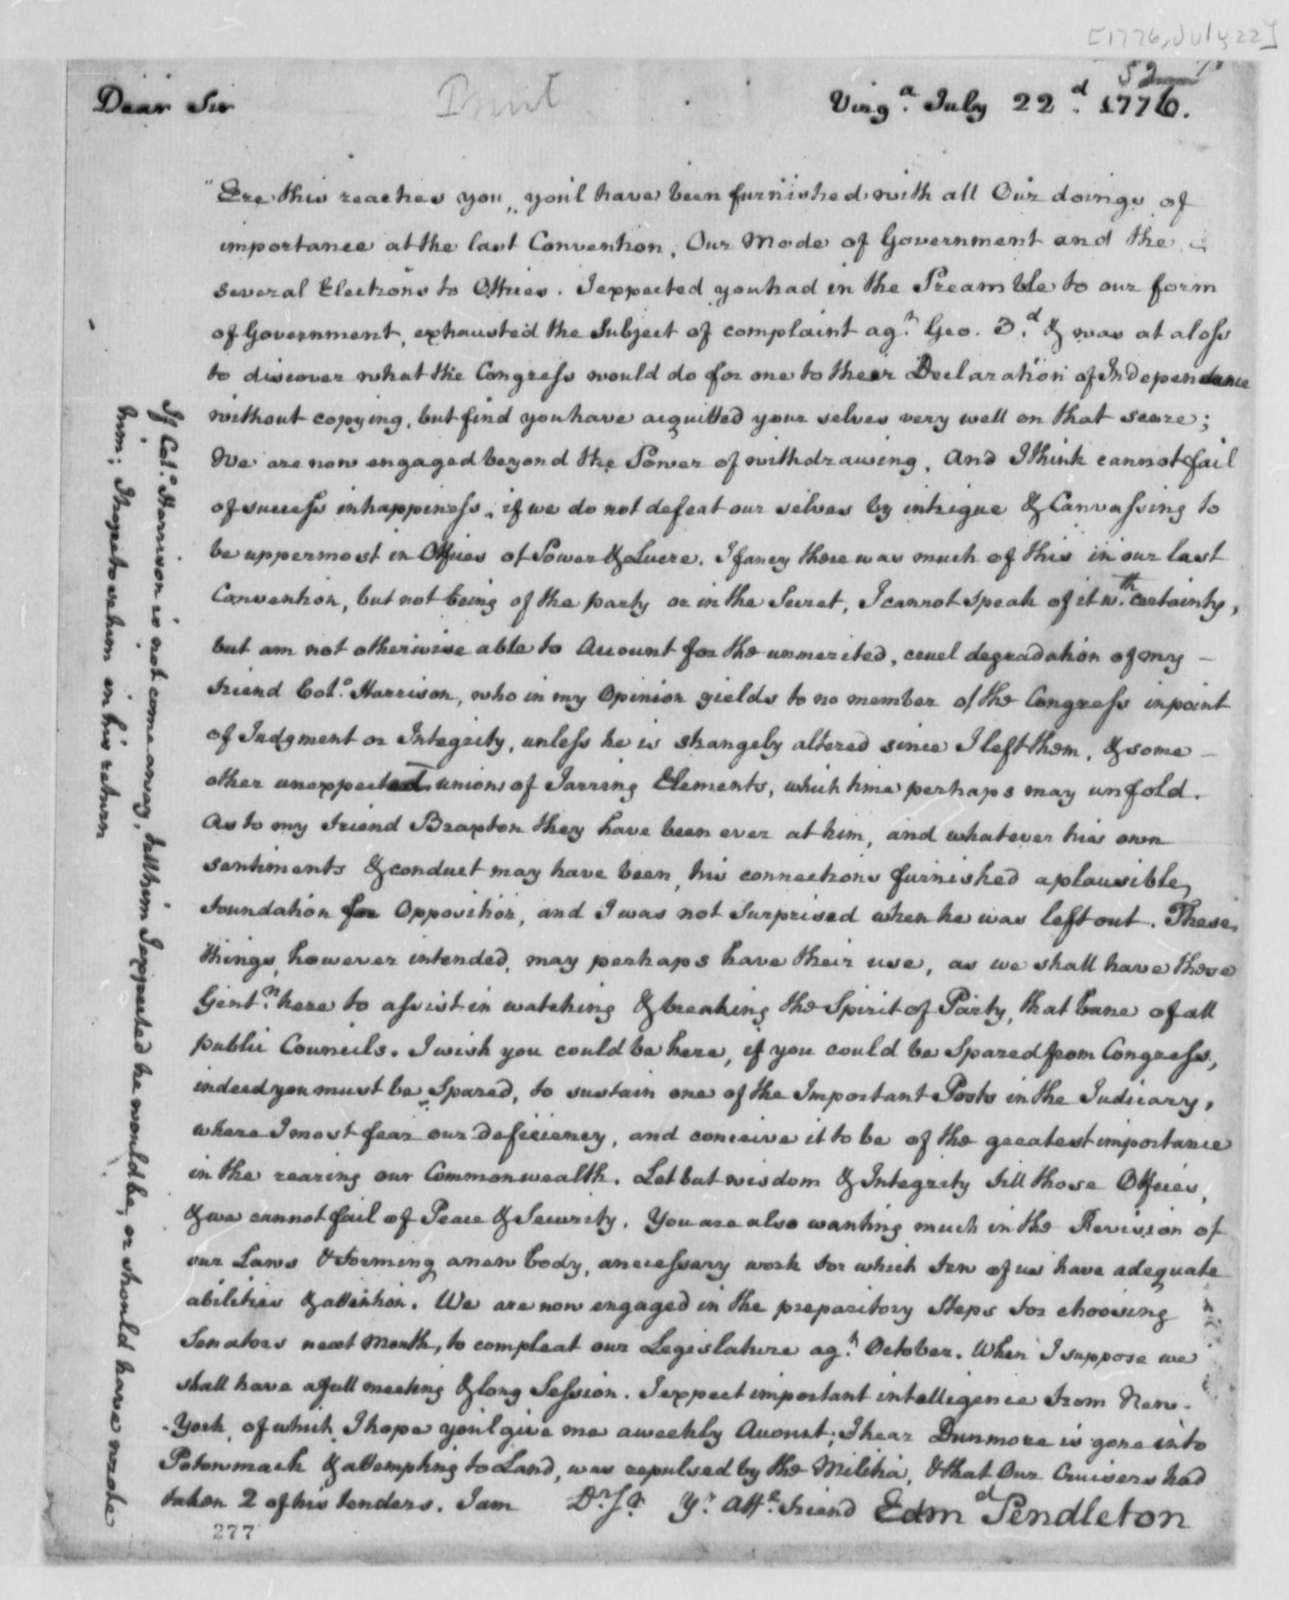 Edmund Pendleton to Thomas Jefferson, July 22, 1776, Virginia Convention; Declaration of Independence